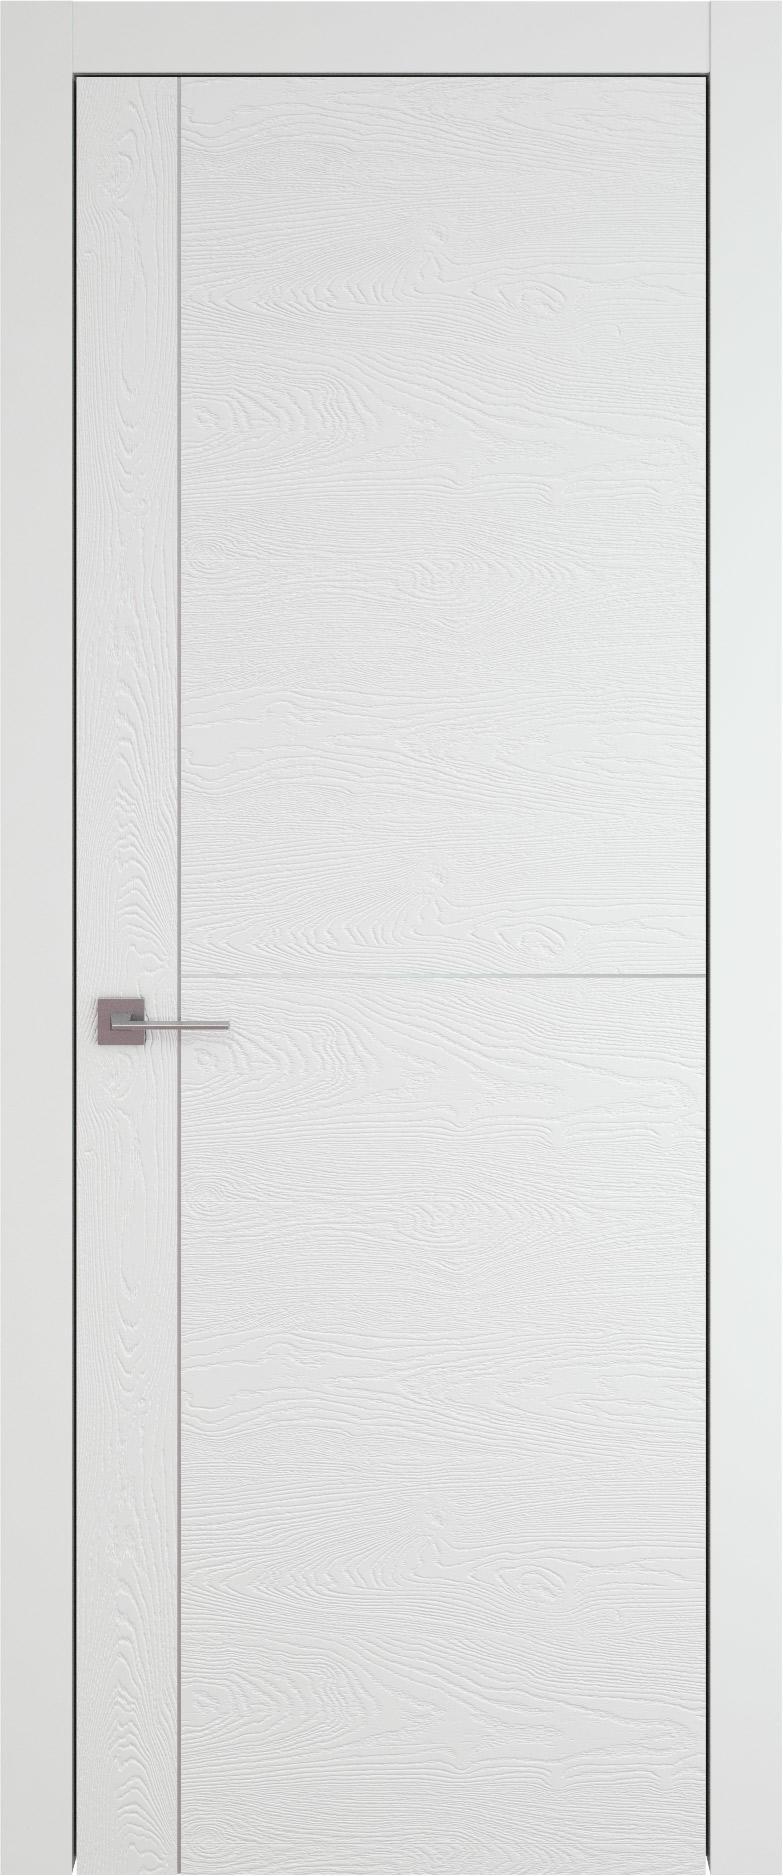 Tivoli Е-3 цвет - Белая эмаль по шпону (RAL 9003) Без стекла (ДГ)